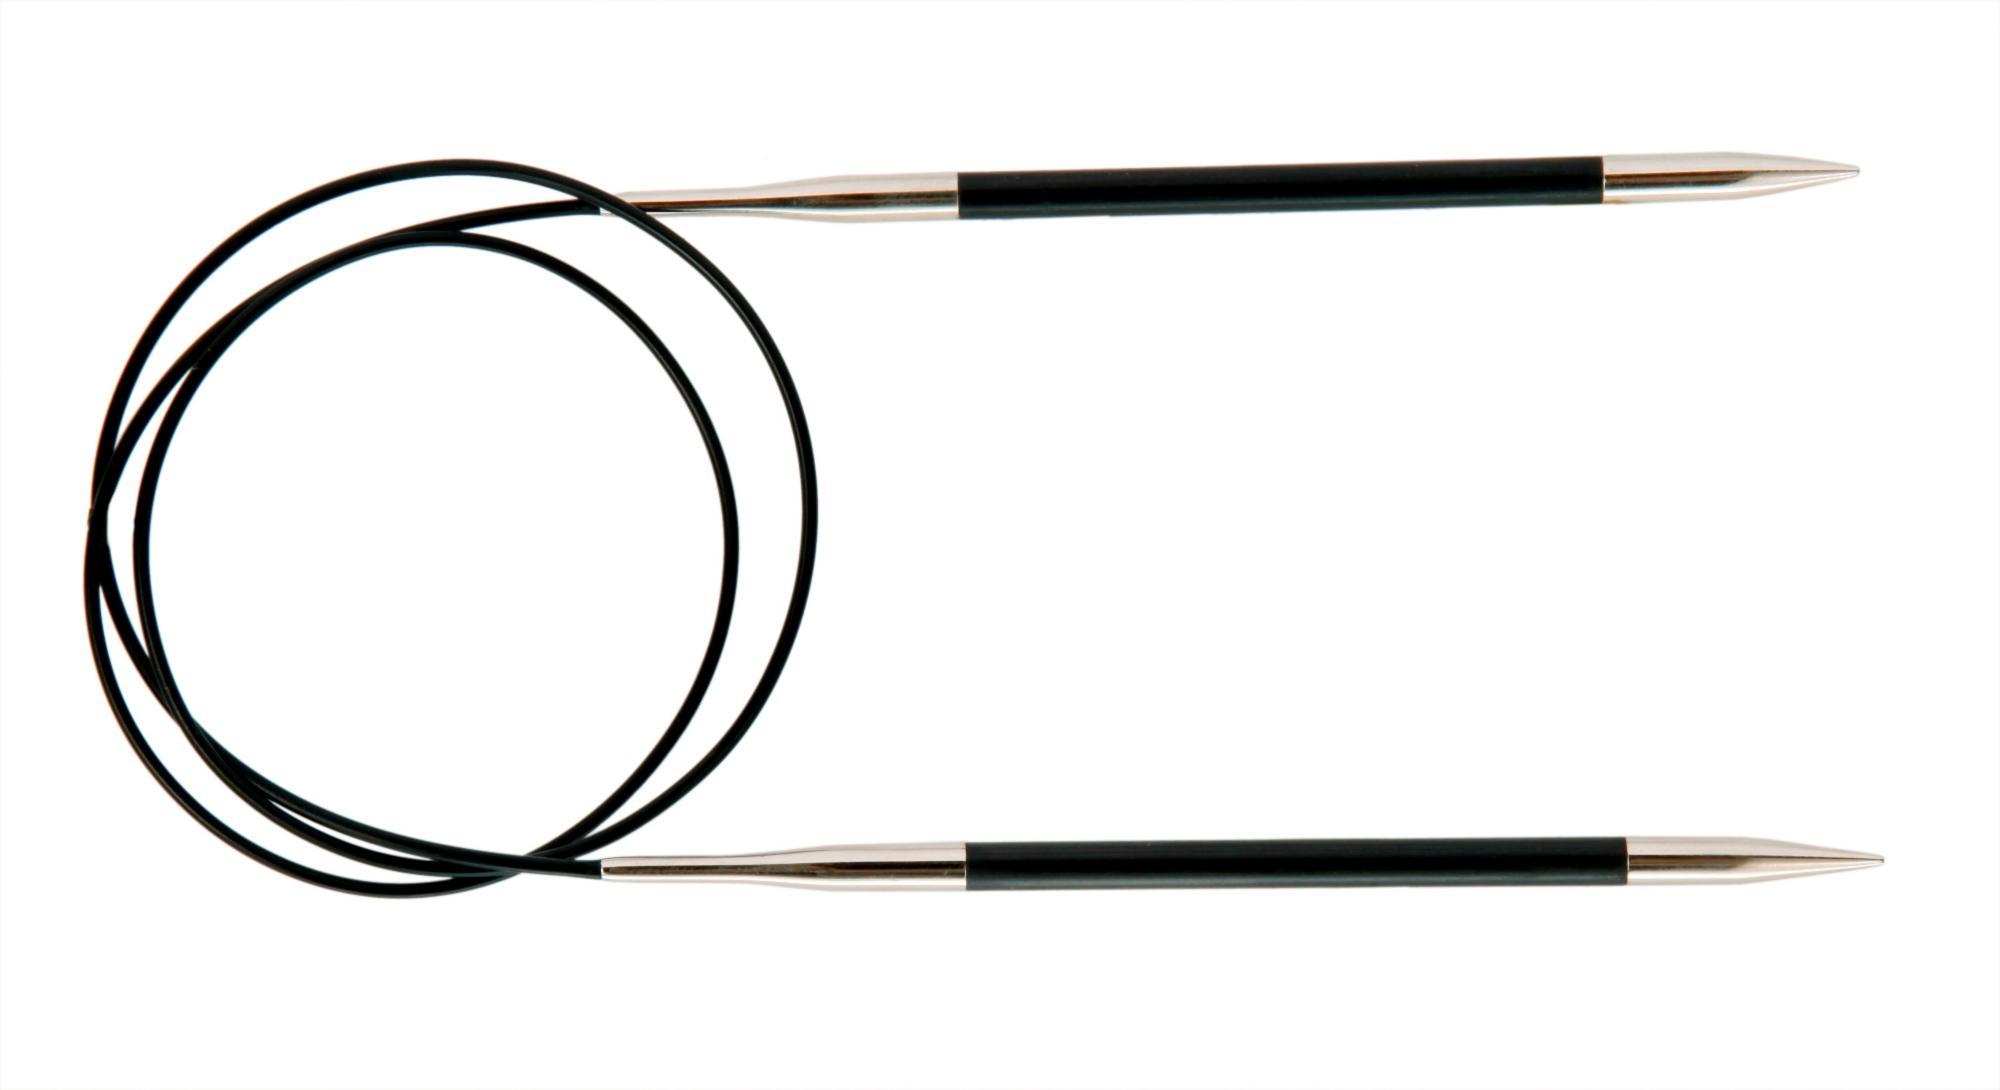 Спицы круговые 80 см Karbonz KnitPro, 41182, 2.50 мм